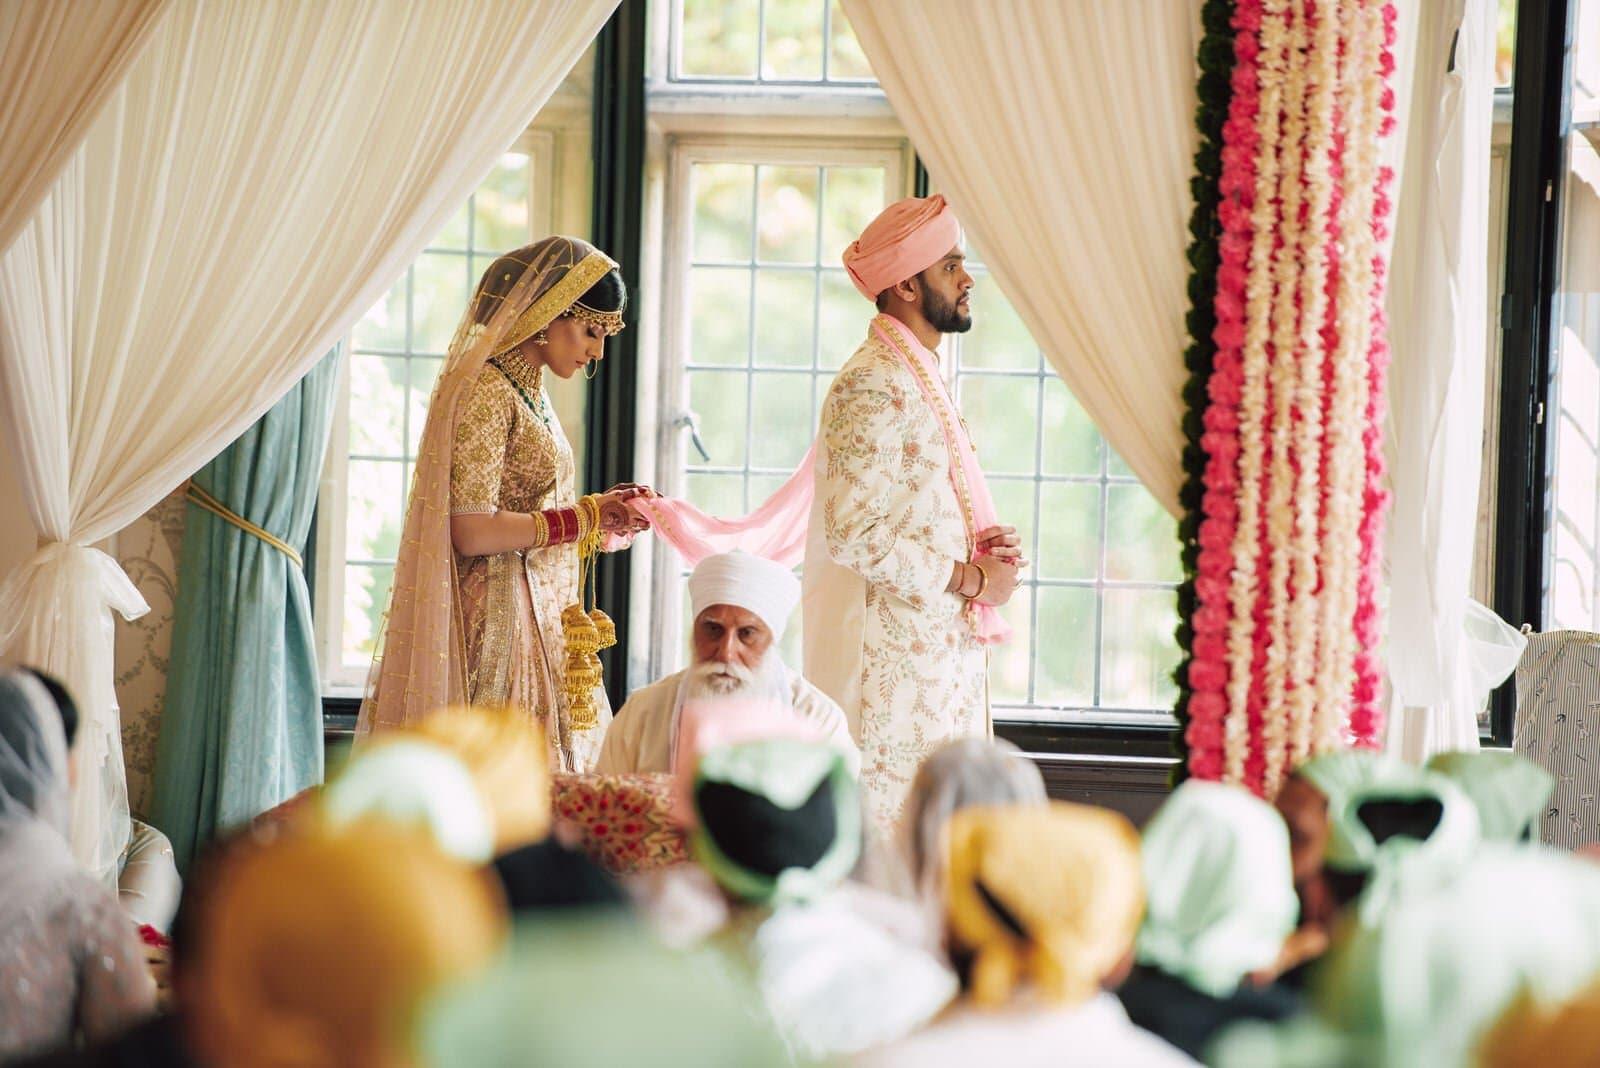 Sikh wedding photography at Dunchurch Park Hall